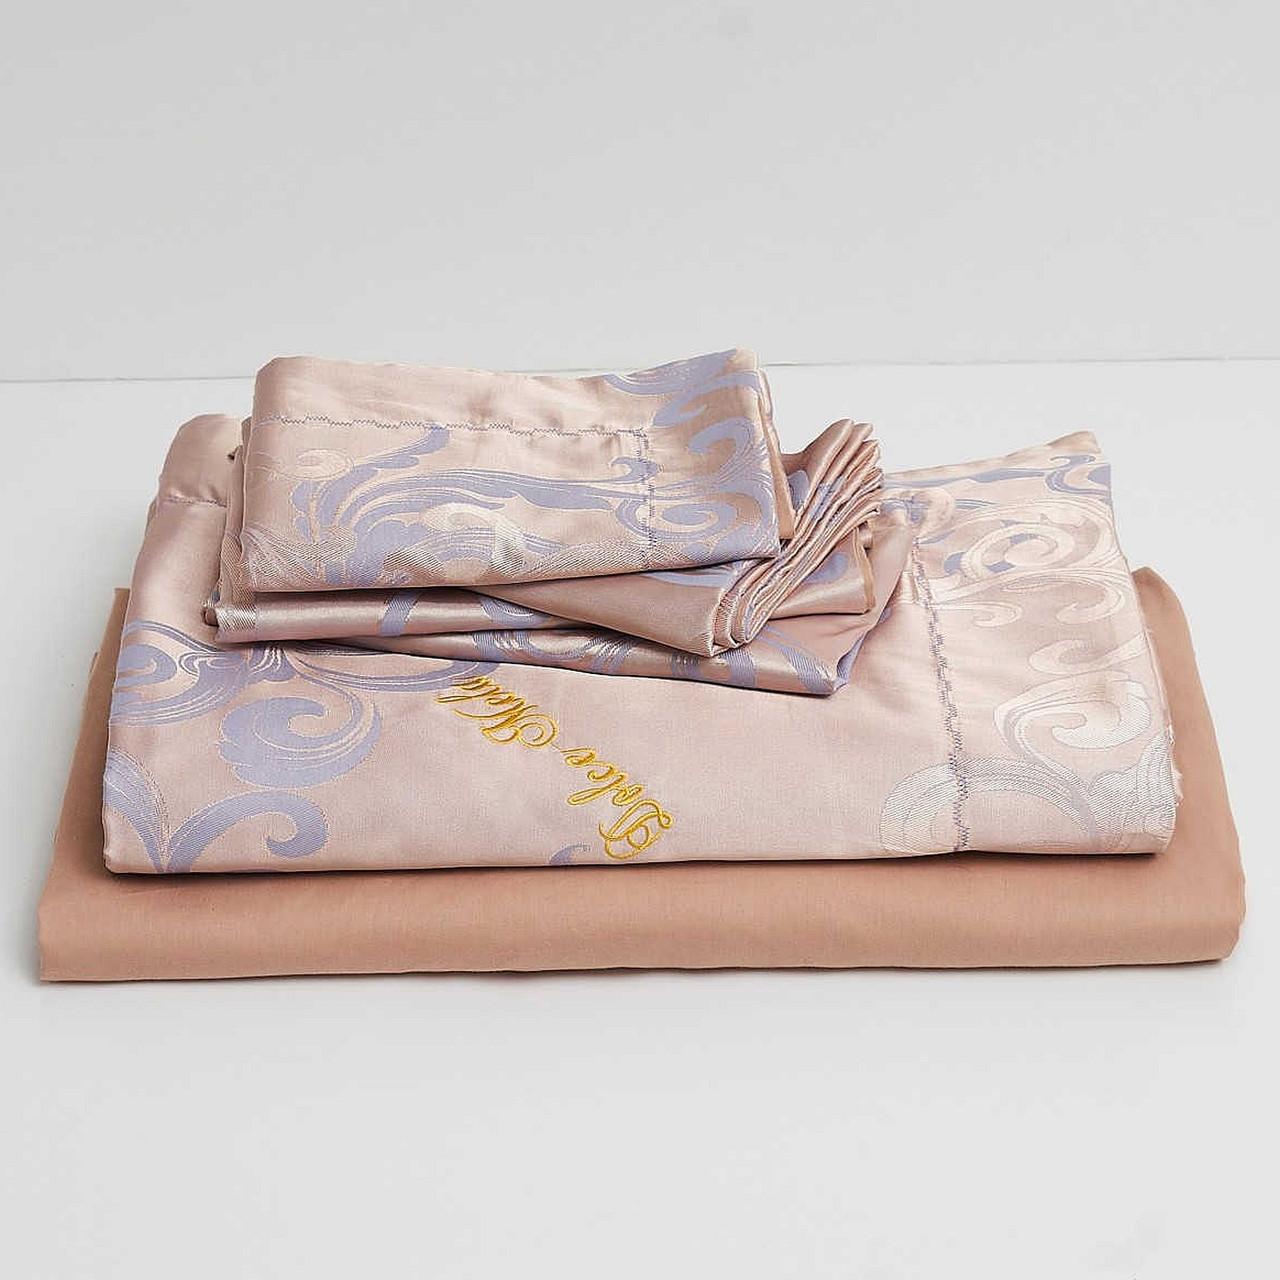 Bed-in-a-Bag Jacquard Duvet Cover Set DM801K for Dropshipping